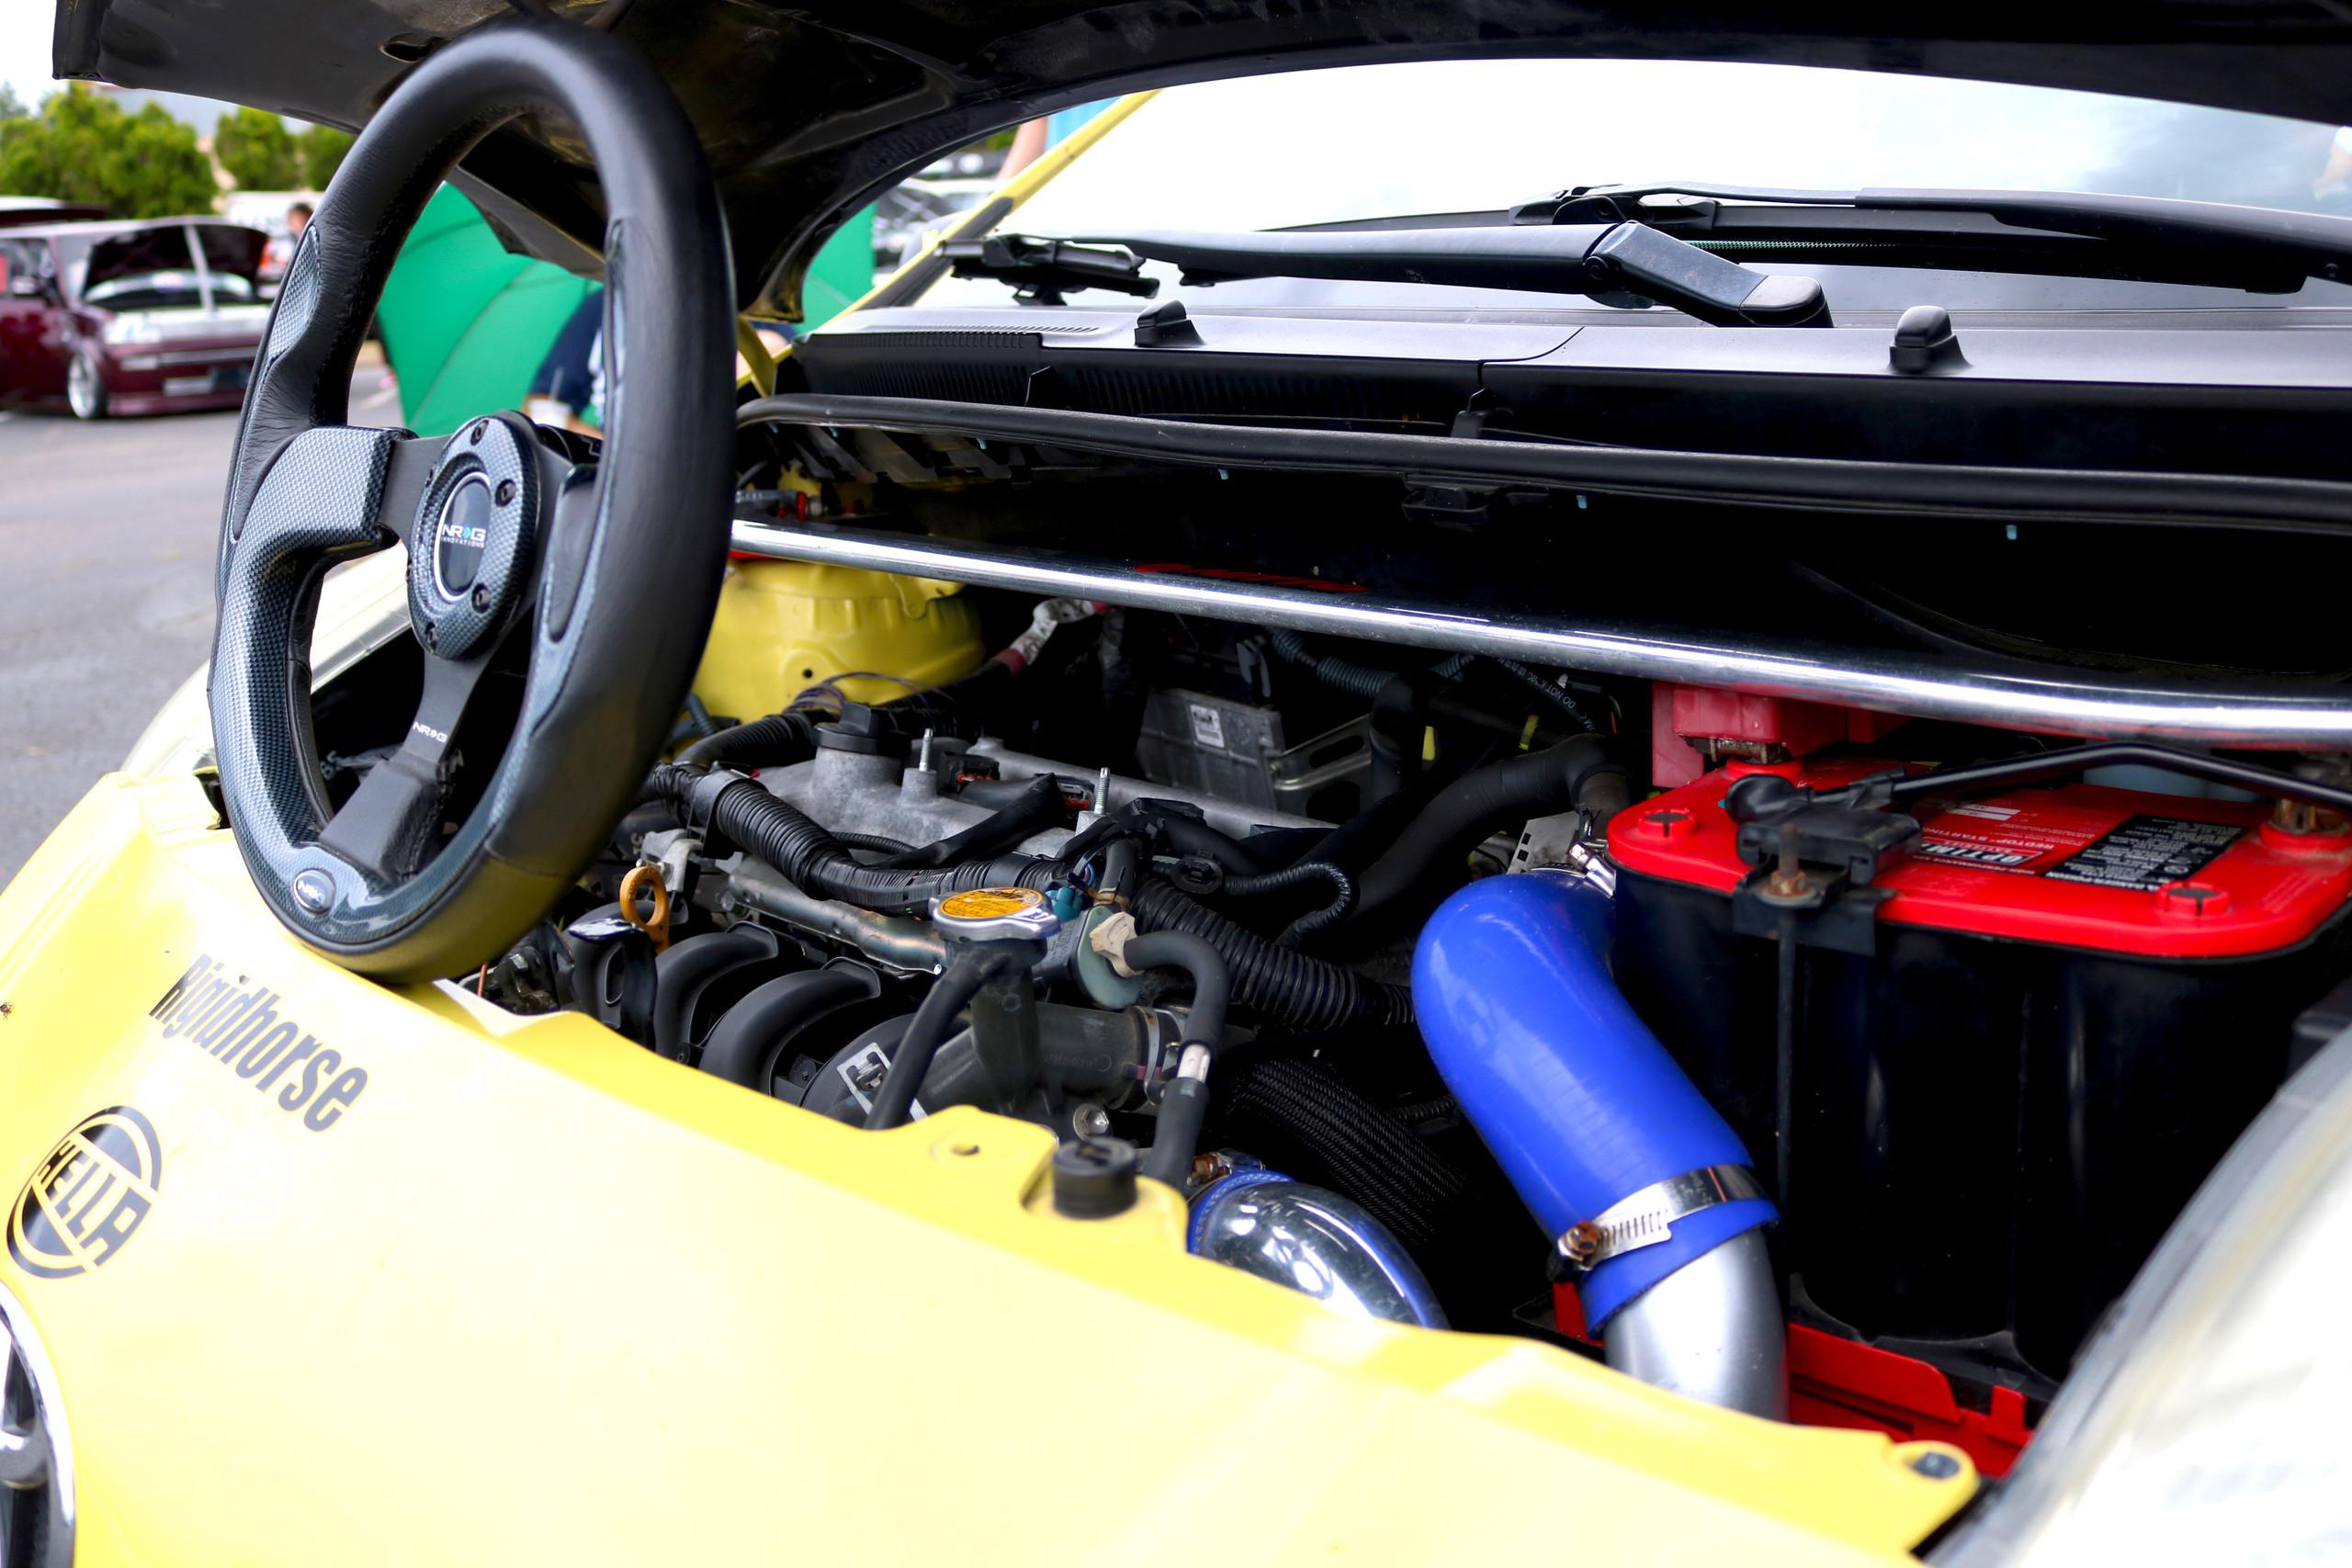 toyota, yaris, autocross, track car, 1zz, turbo